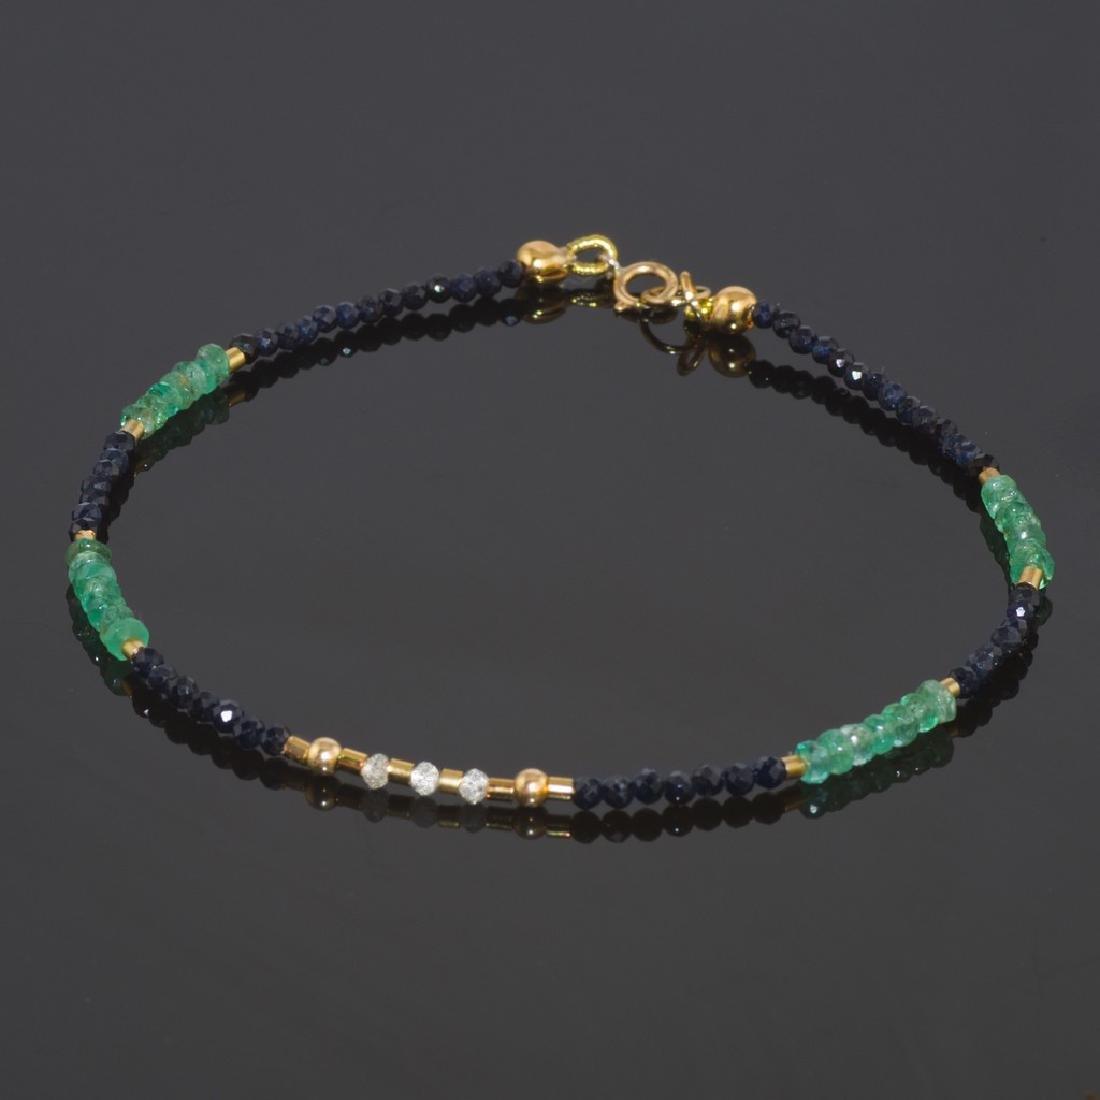 Sapphire and Emerald bracelet with Diamonds 0.2 carat